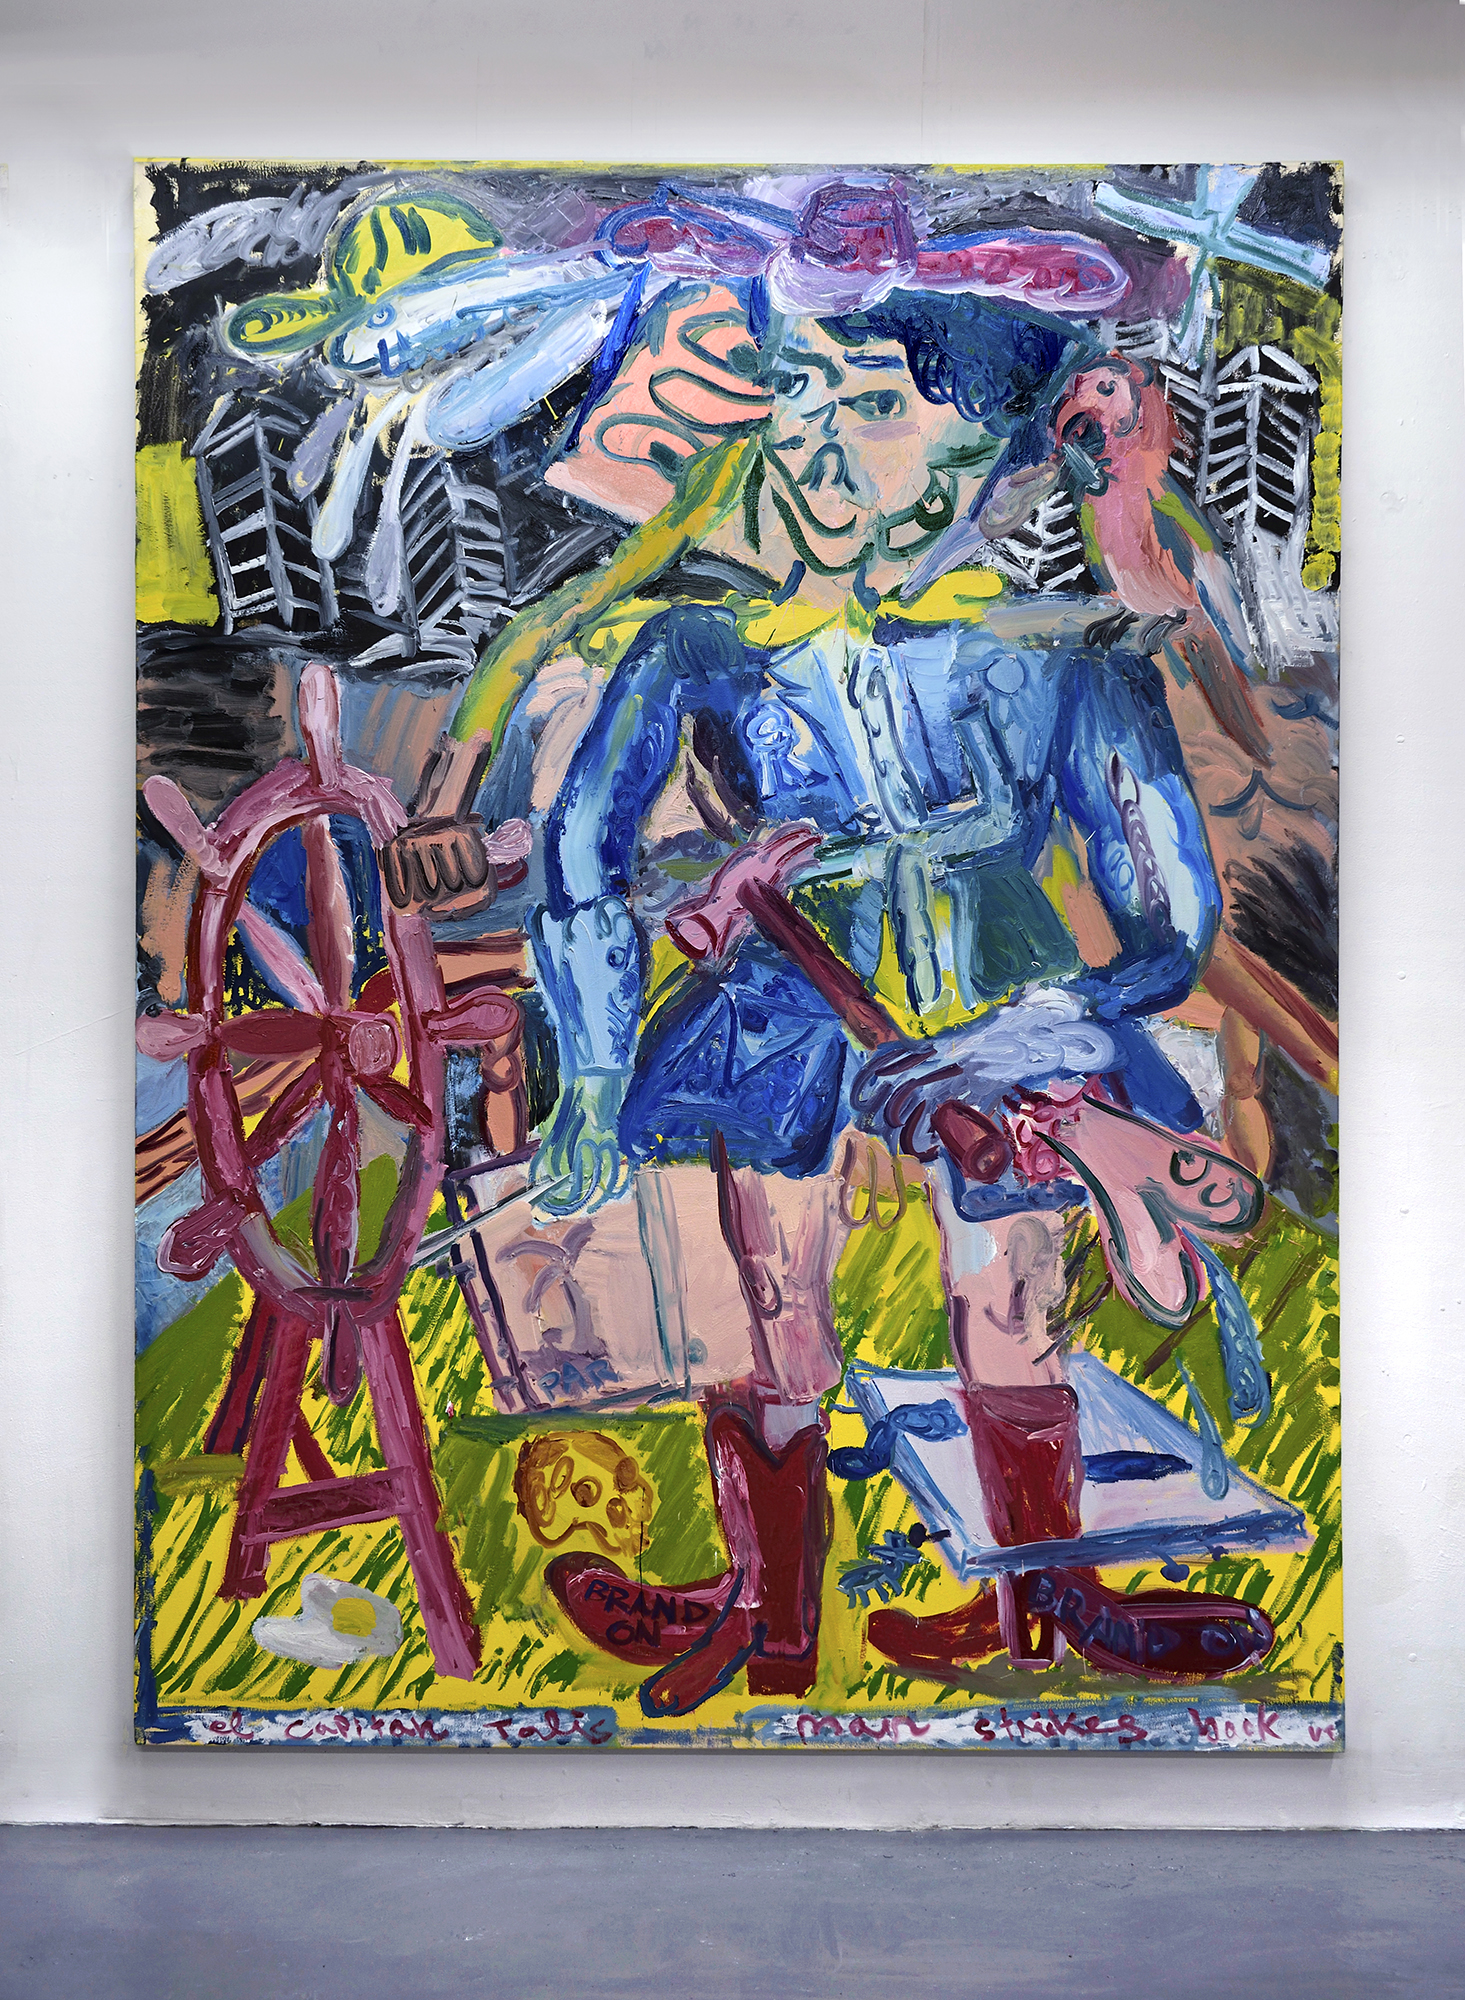 'El Capitan Talisman strikes back (Brand On)' 2019   Oil on canvas. 200 x 150 cm